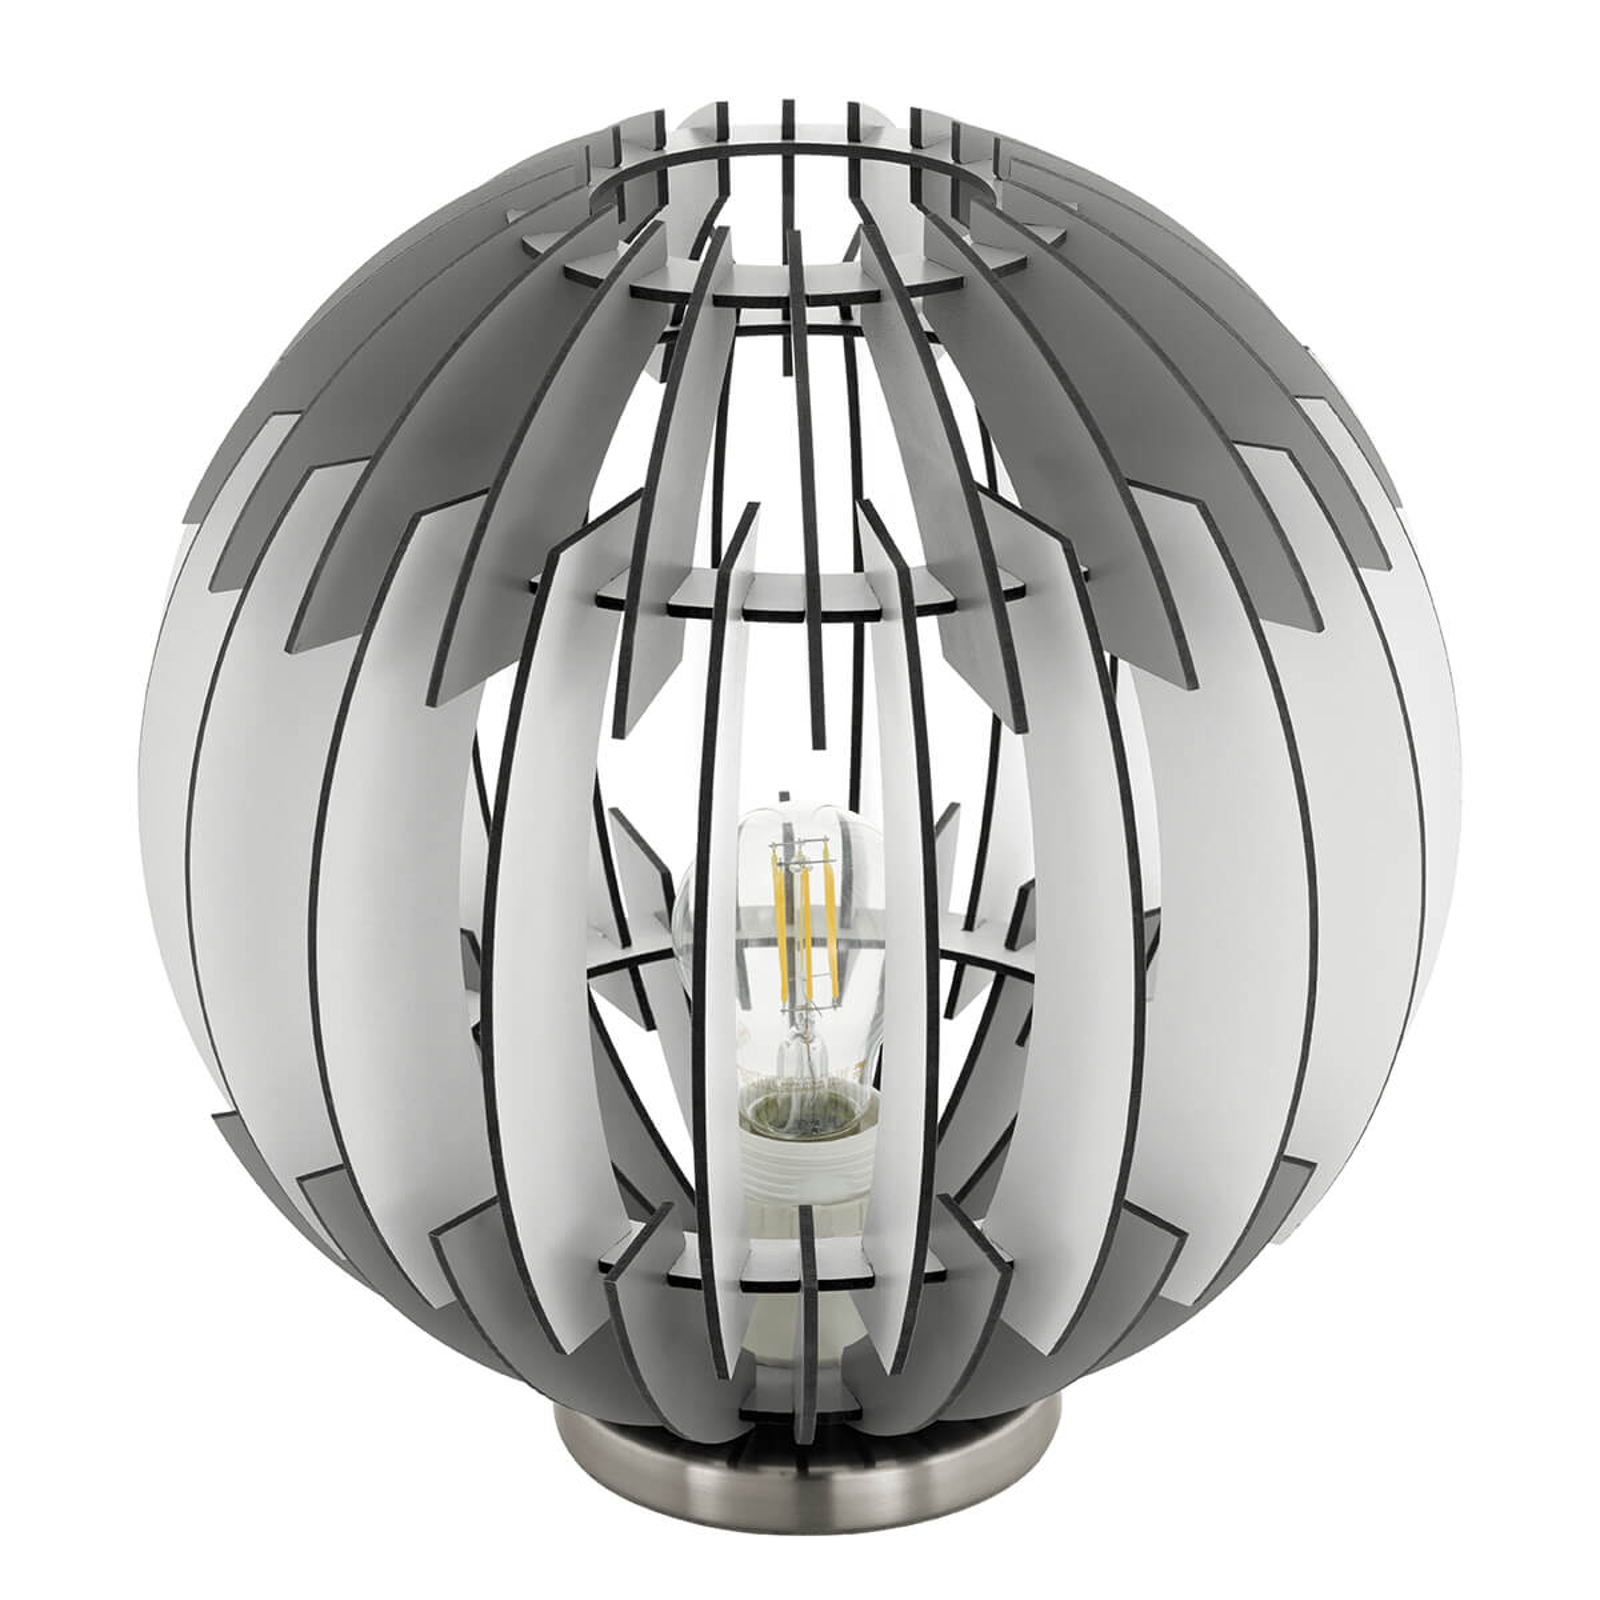 Olmero - trendy tafellamp met lamellenkap